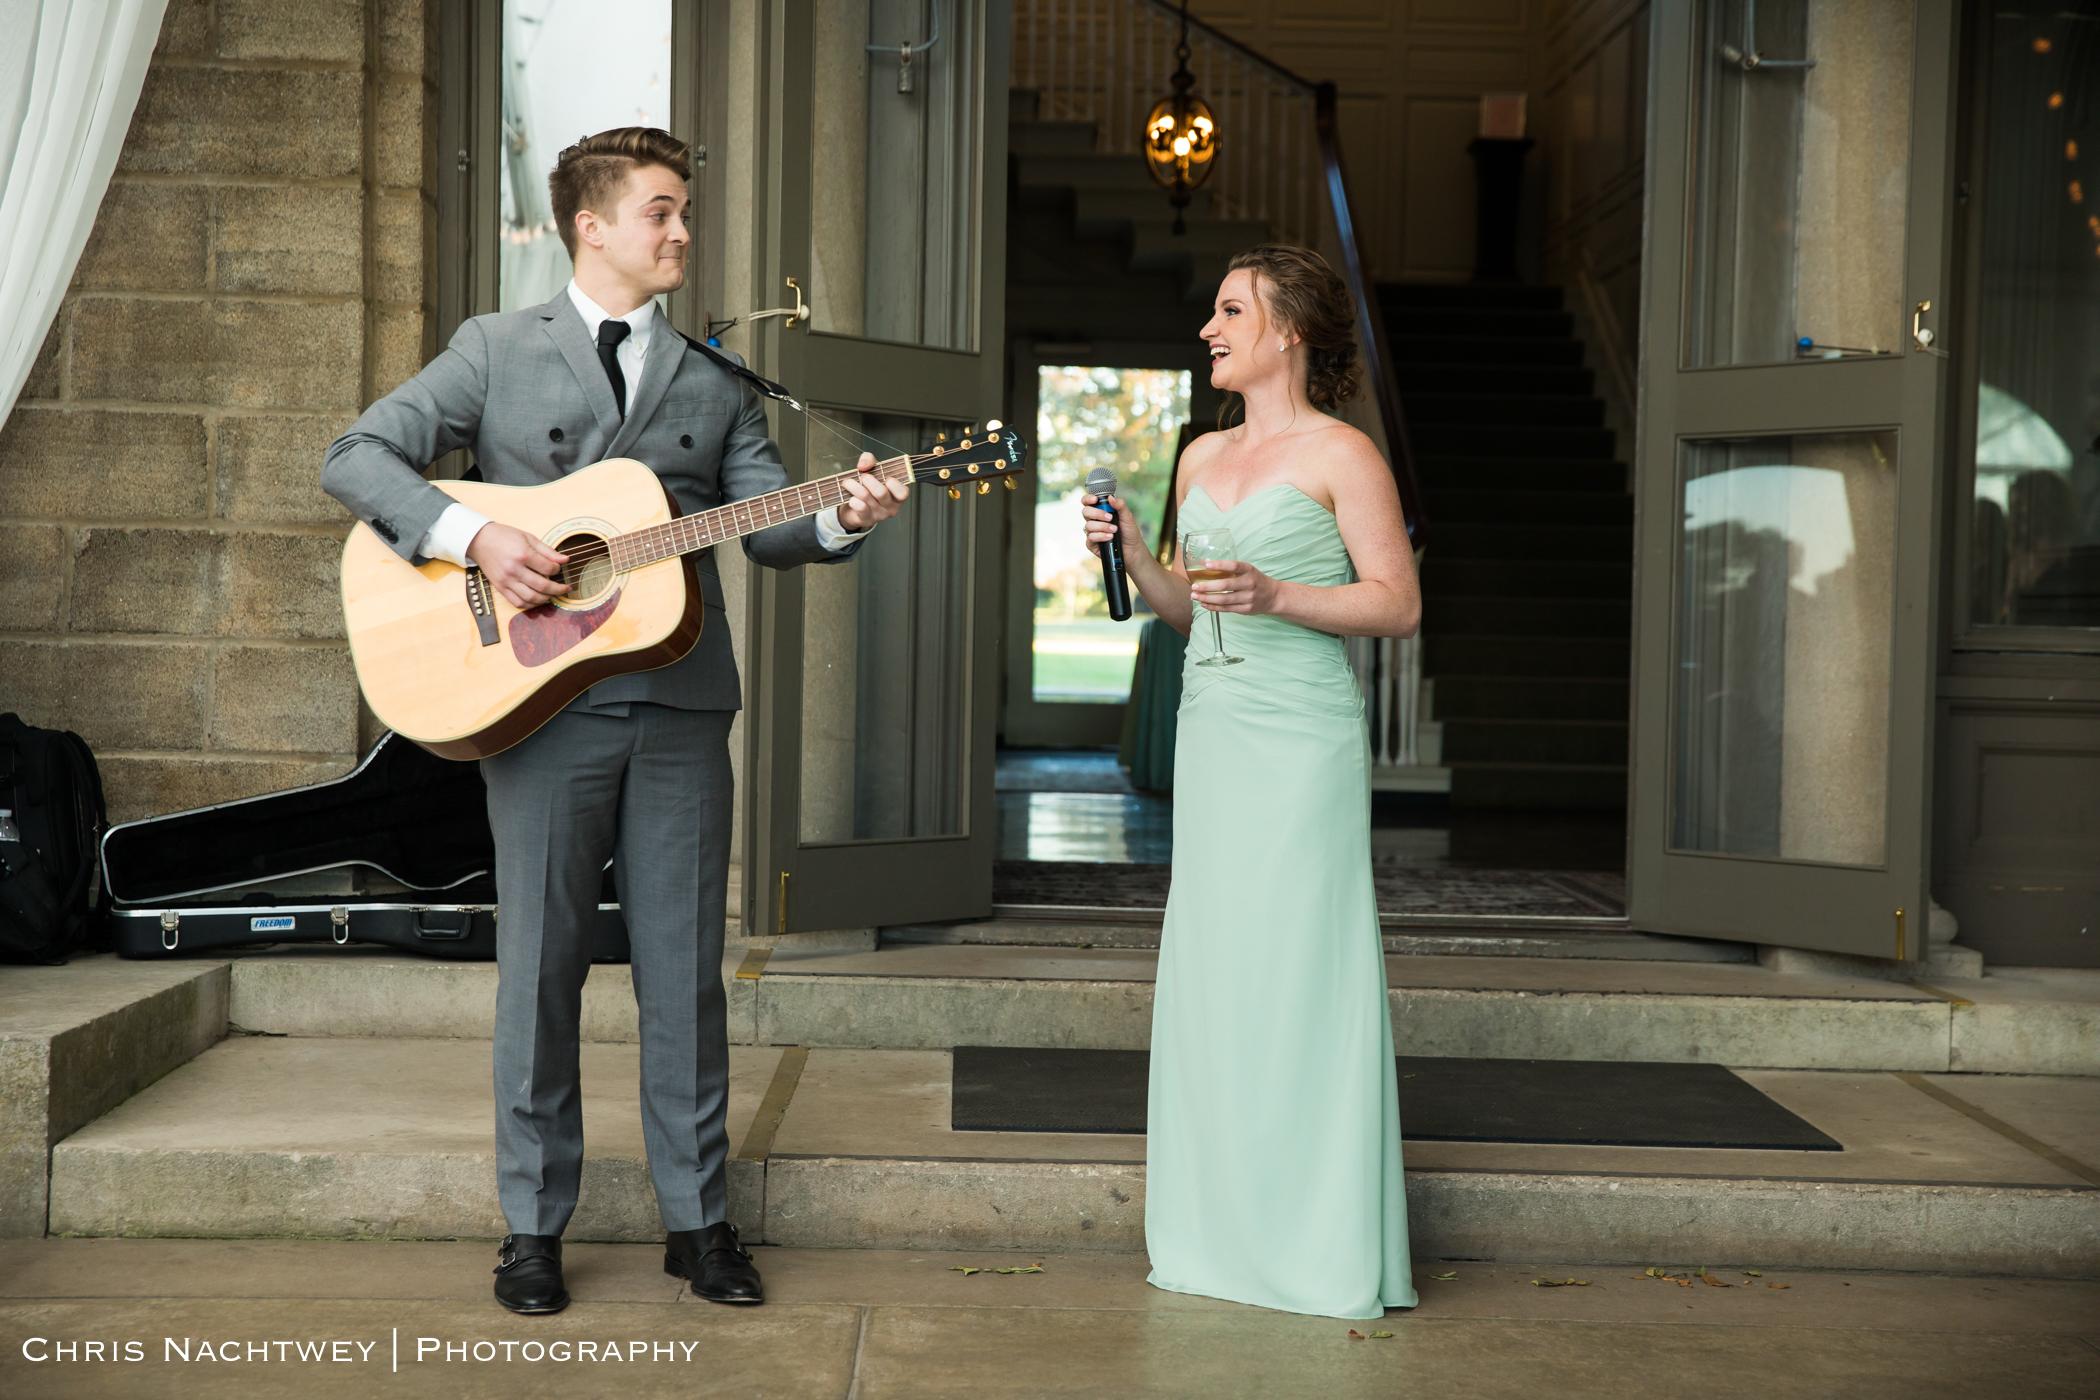 harkness-wedding-photos-chris-nachtwey-photography-2018-29.jpg